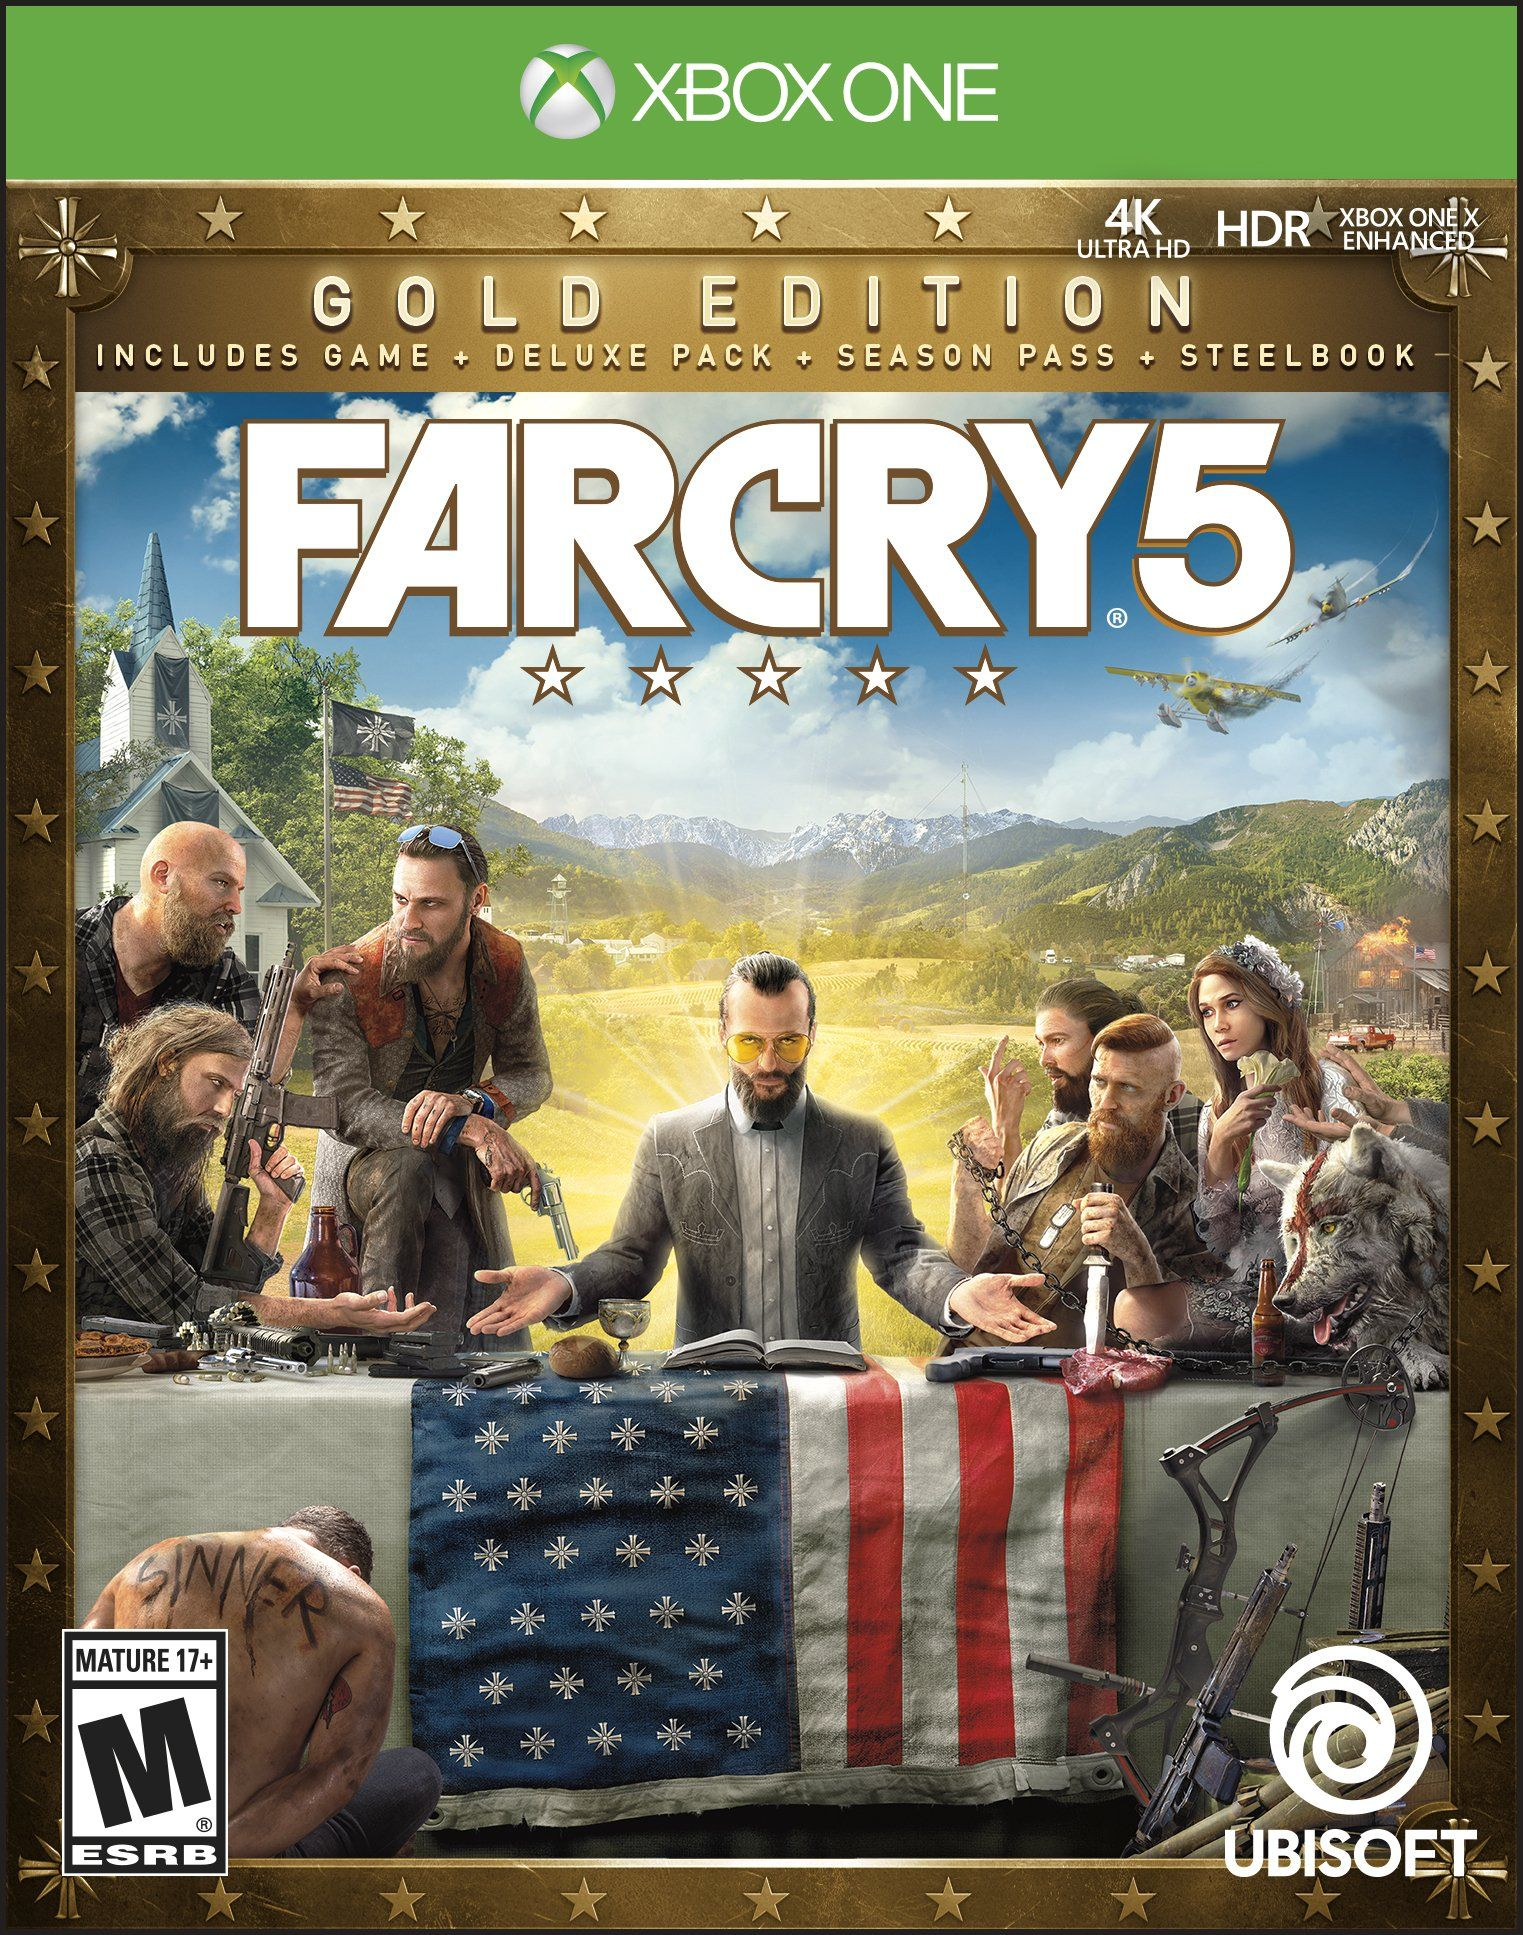 Far Cry 5 Steelbook Gold Edition Far Cry 5 Game Far Cry 5 Far Cry 5 Ps4